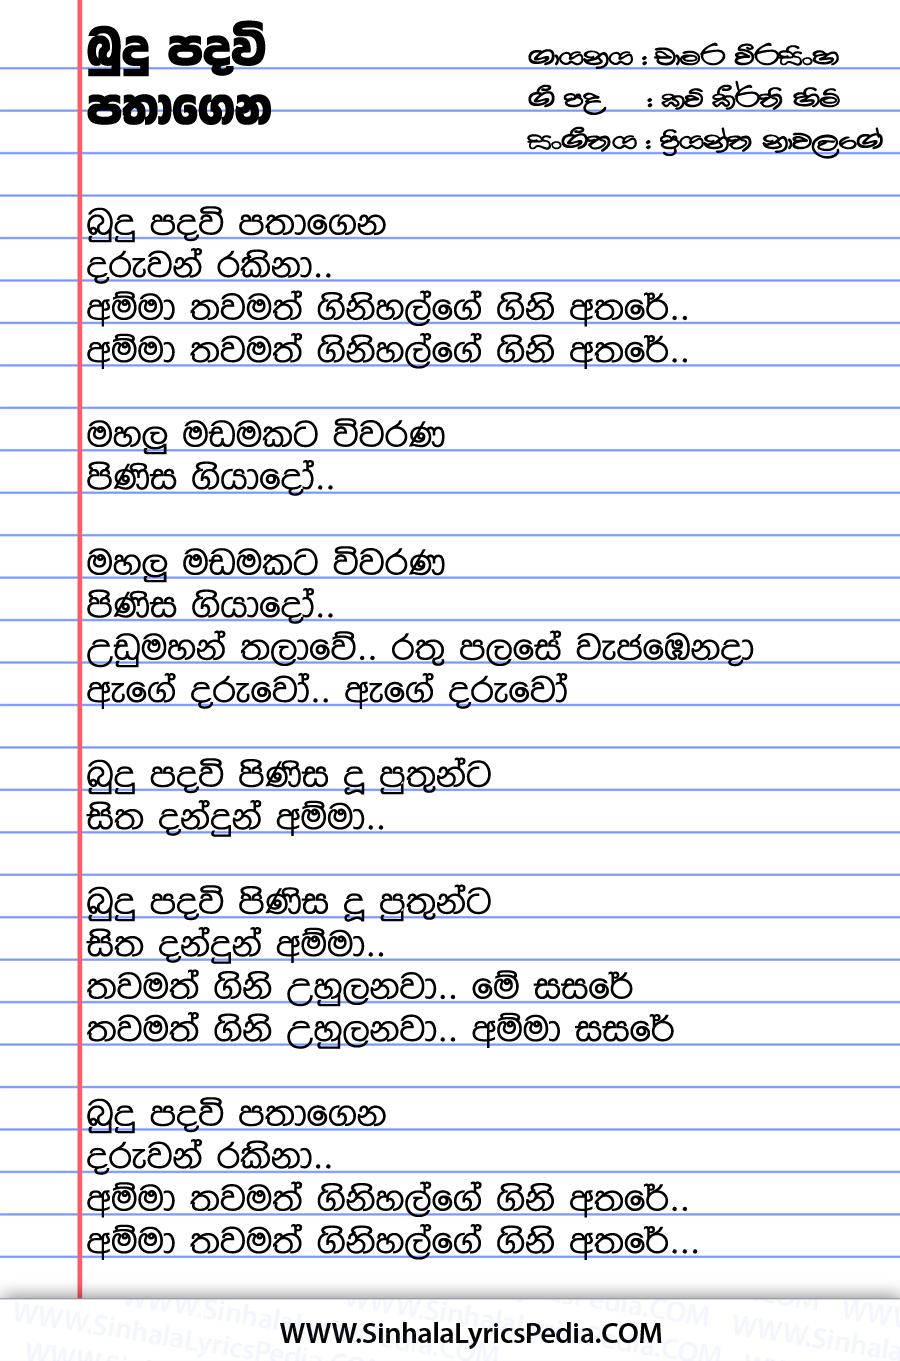 Budu Padavi Pathagena Song Lyrics